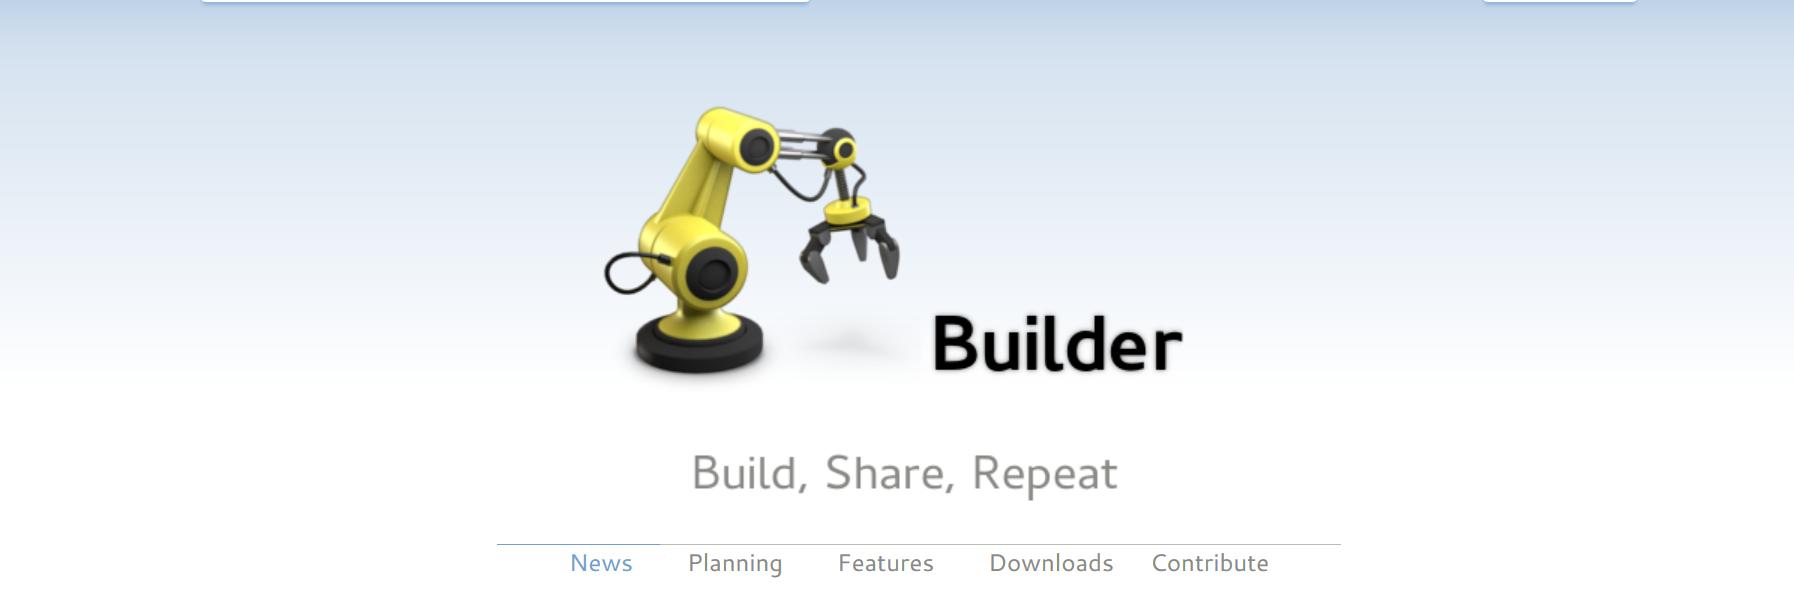 gnome-builder